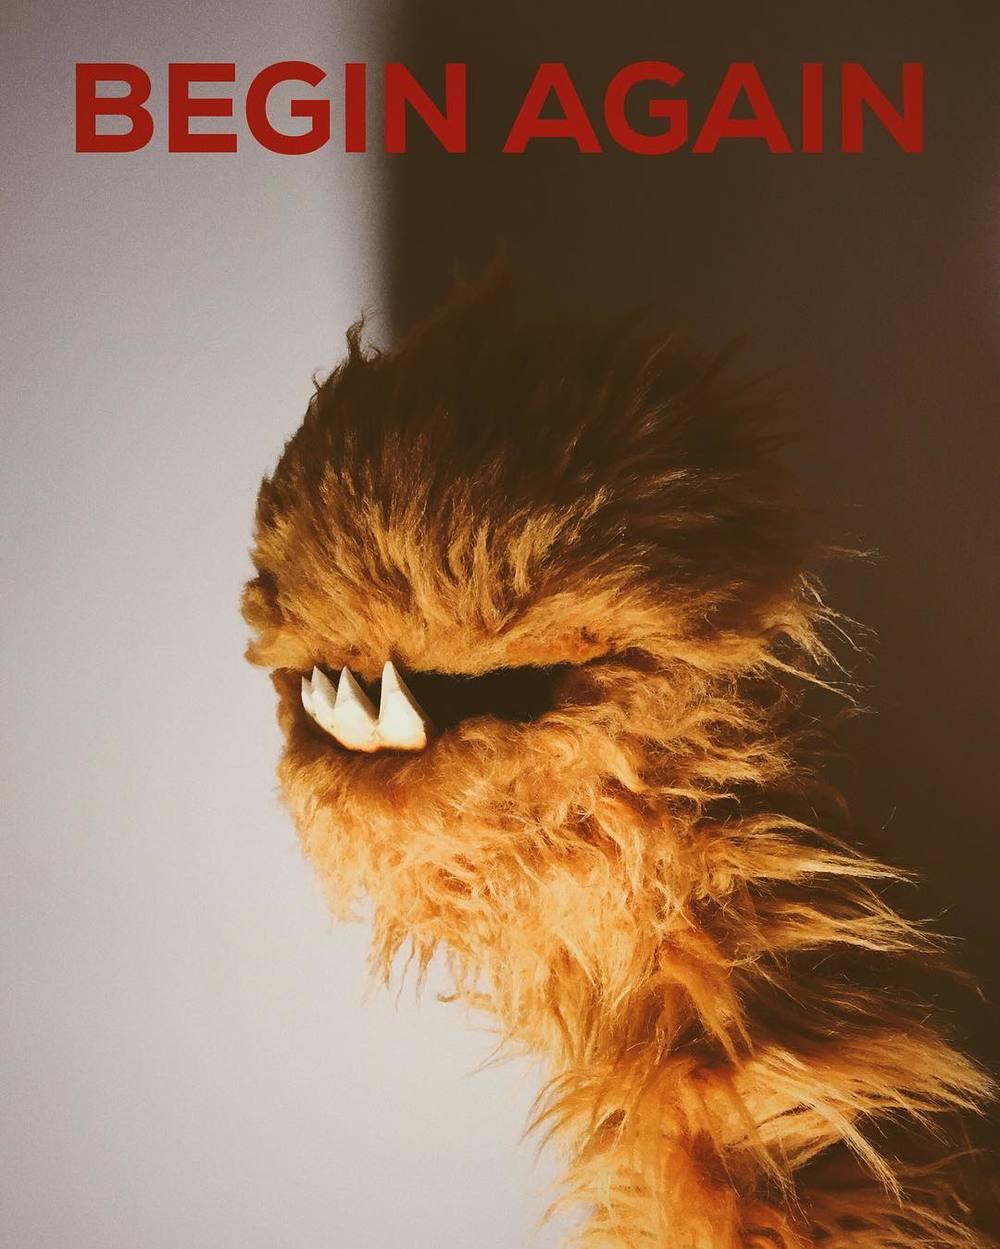 Inspired by the show @strangerthings.netflix. building a spooky #puppet http://ift.tt/2a2gdU4